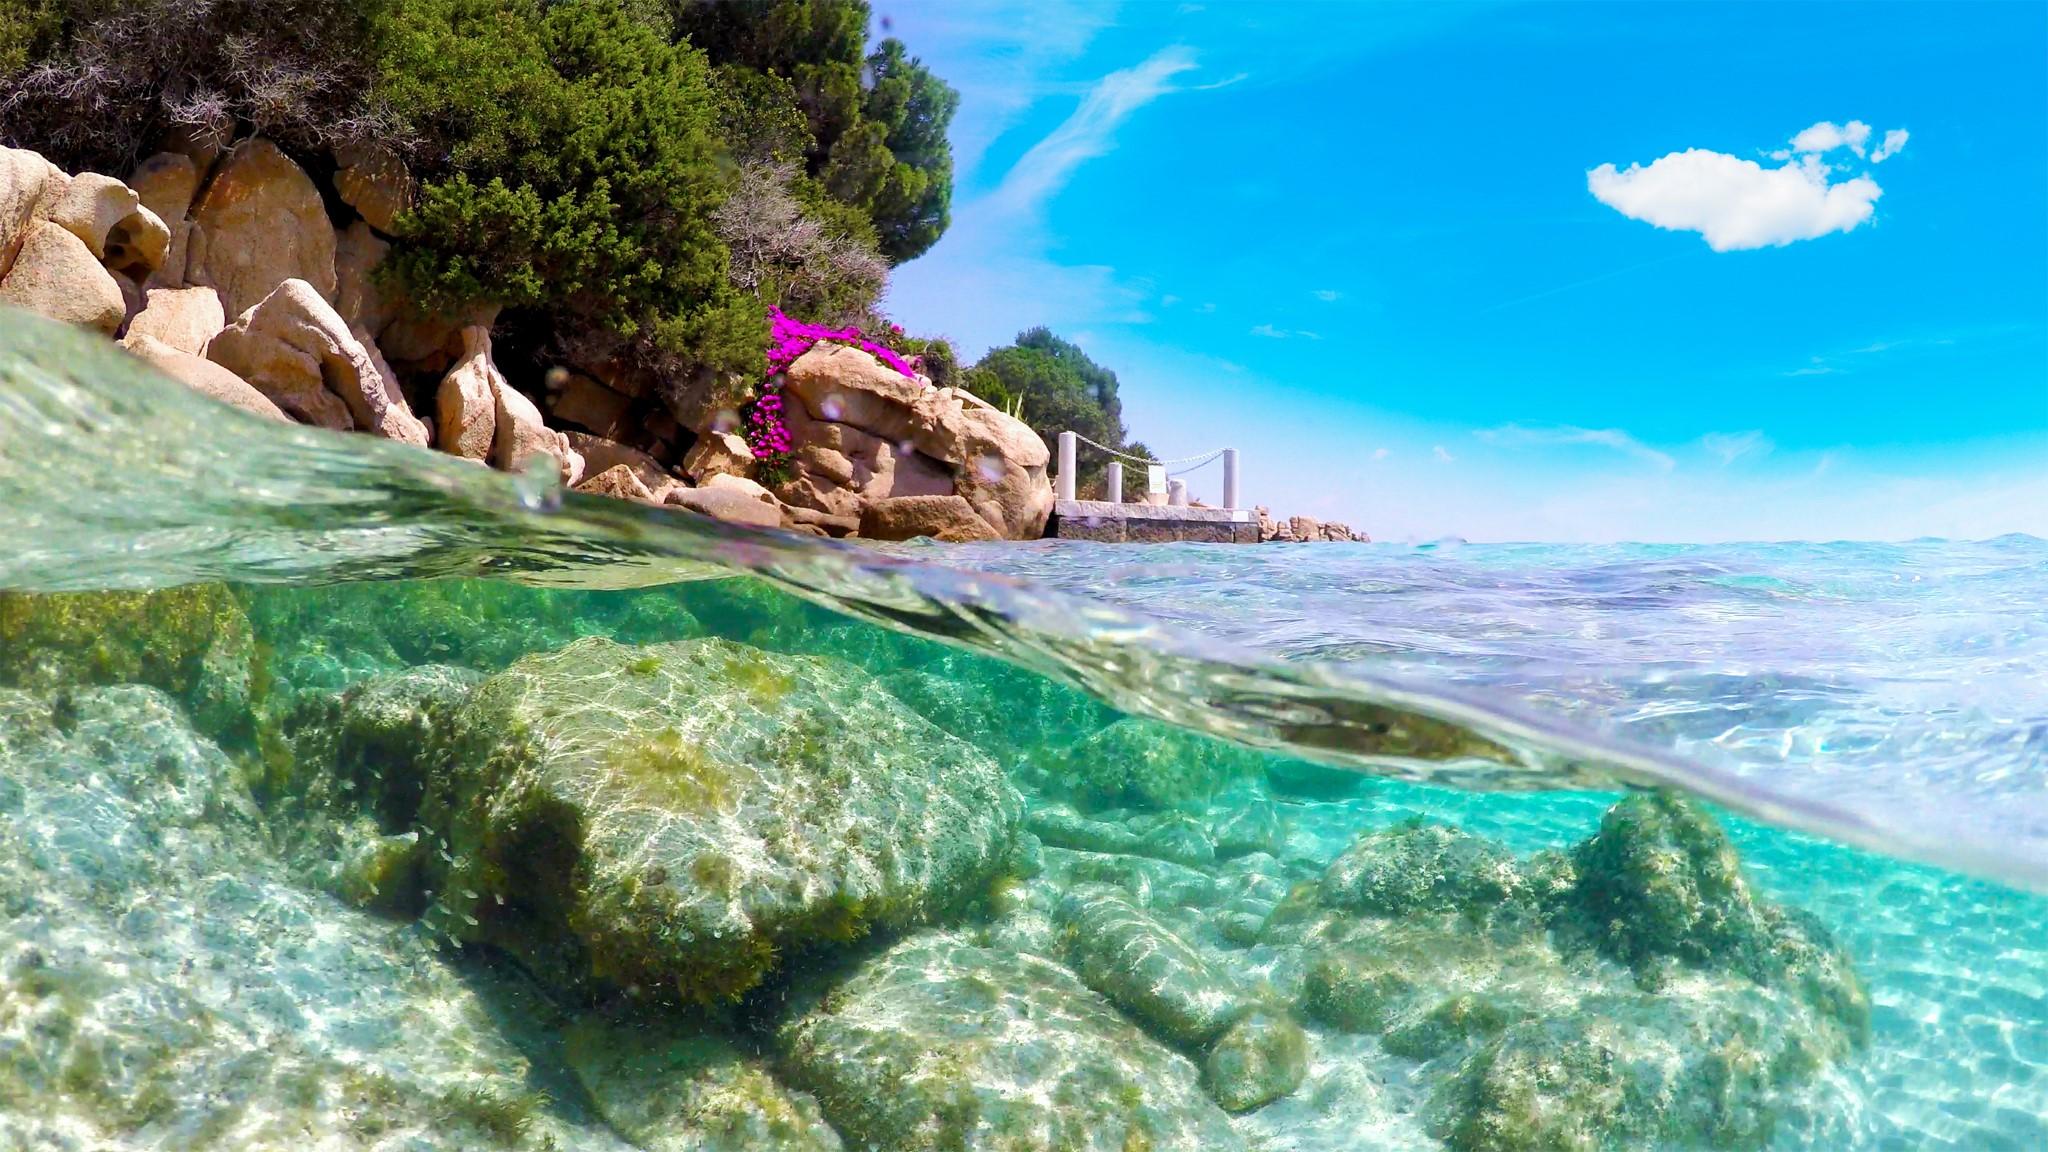 Split underwater view of Capriccioli beach coastline. Sardinia, Italy